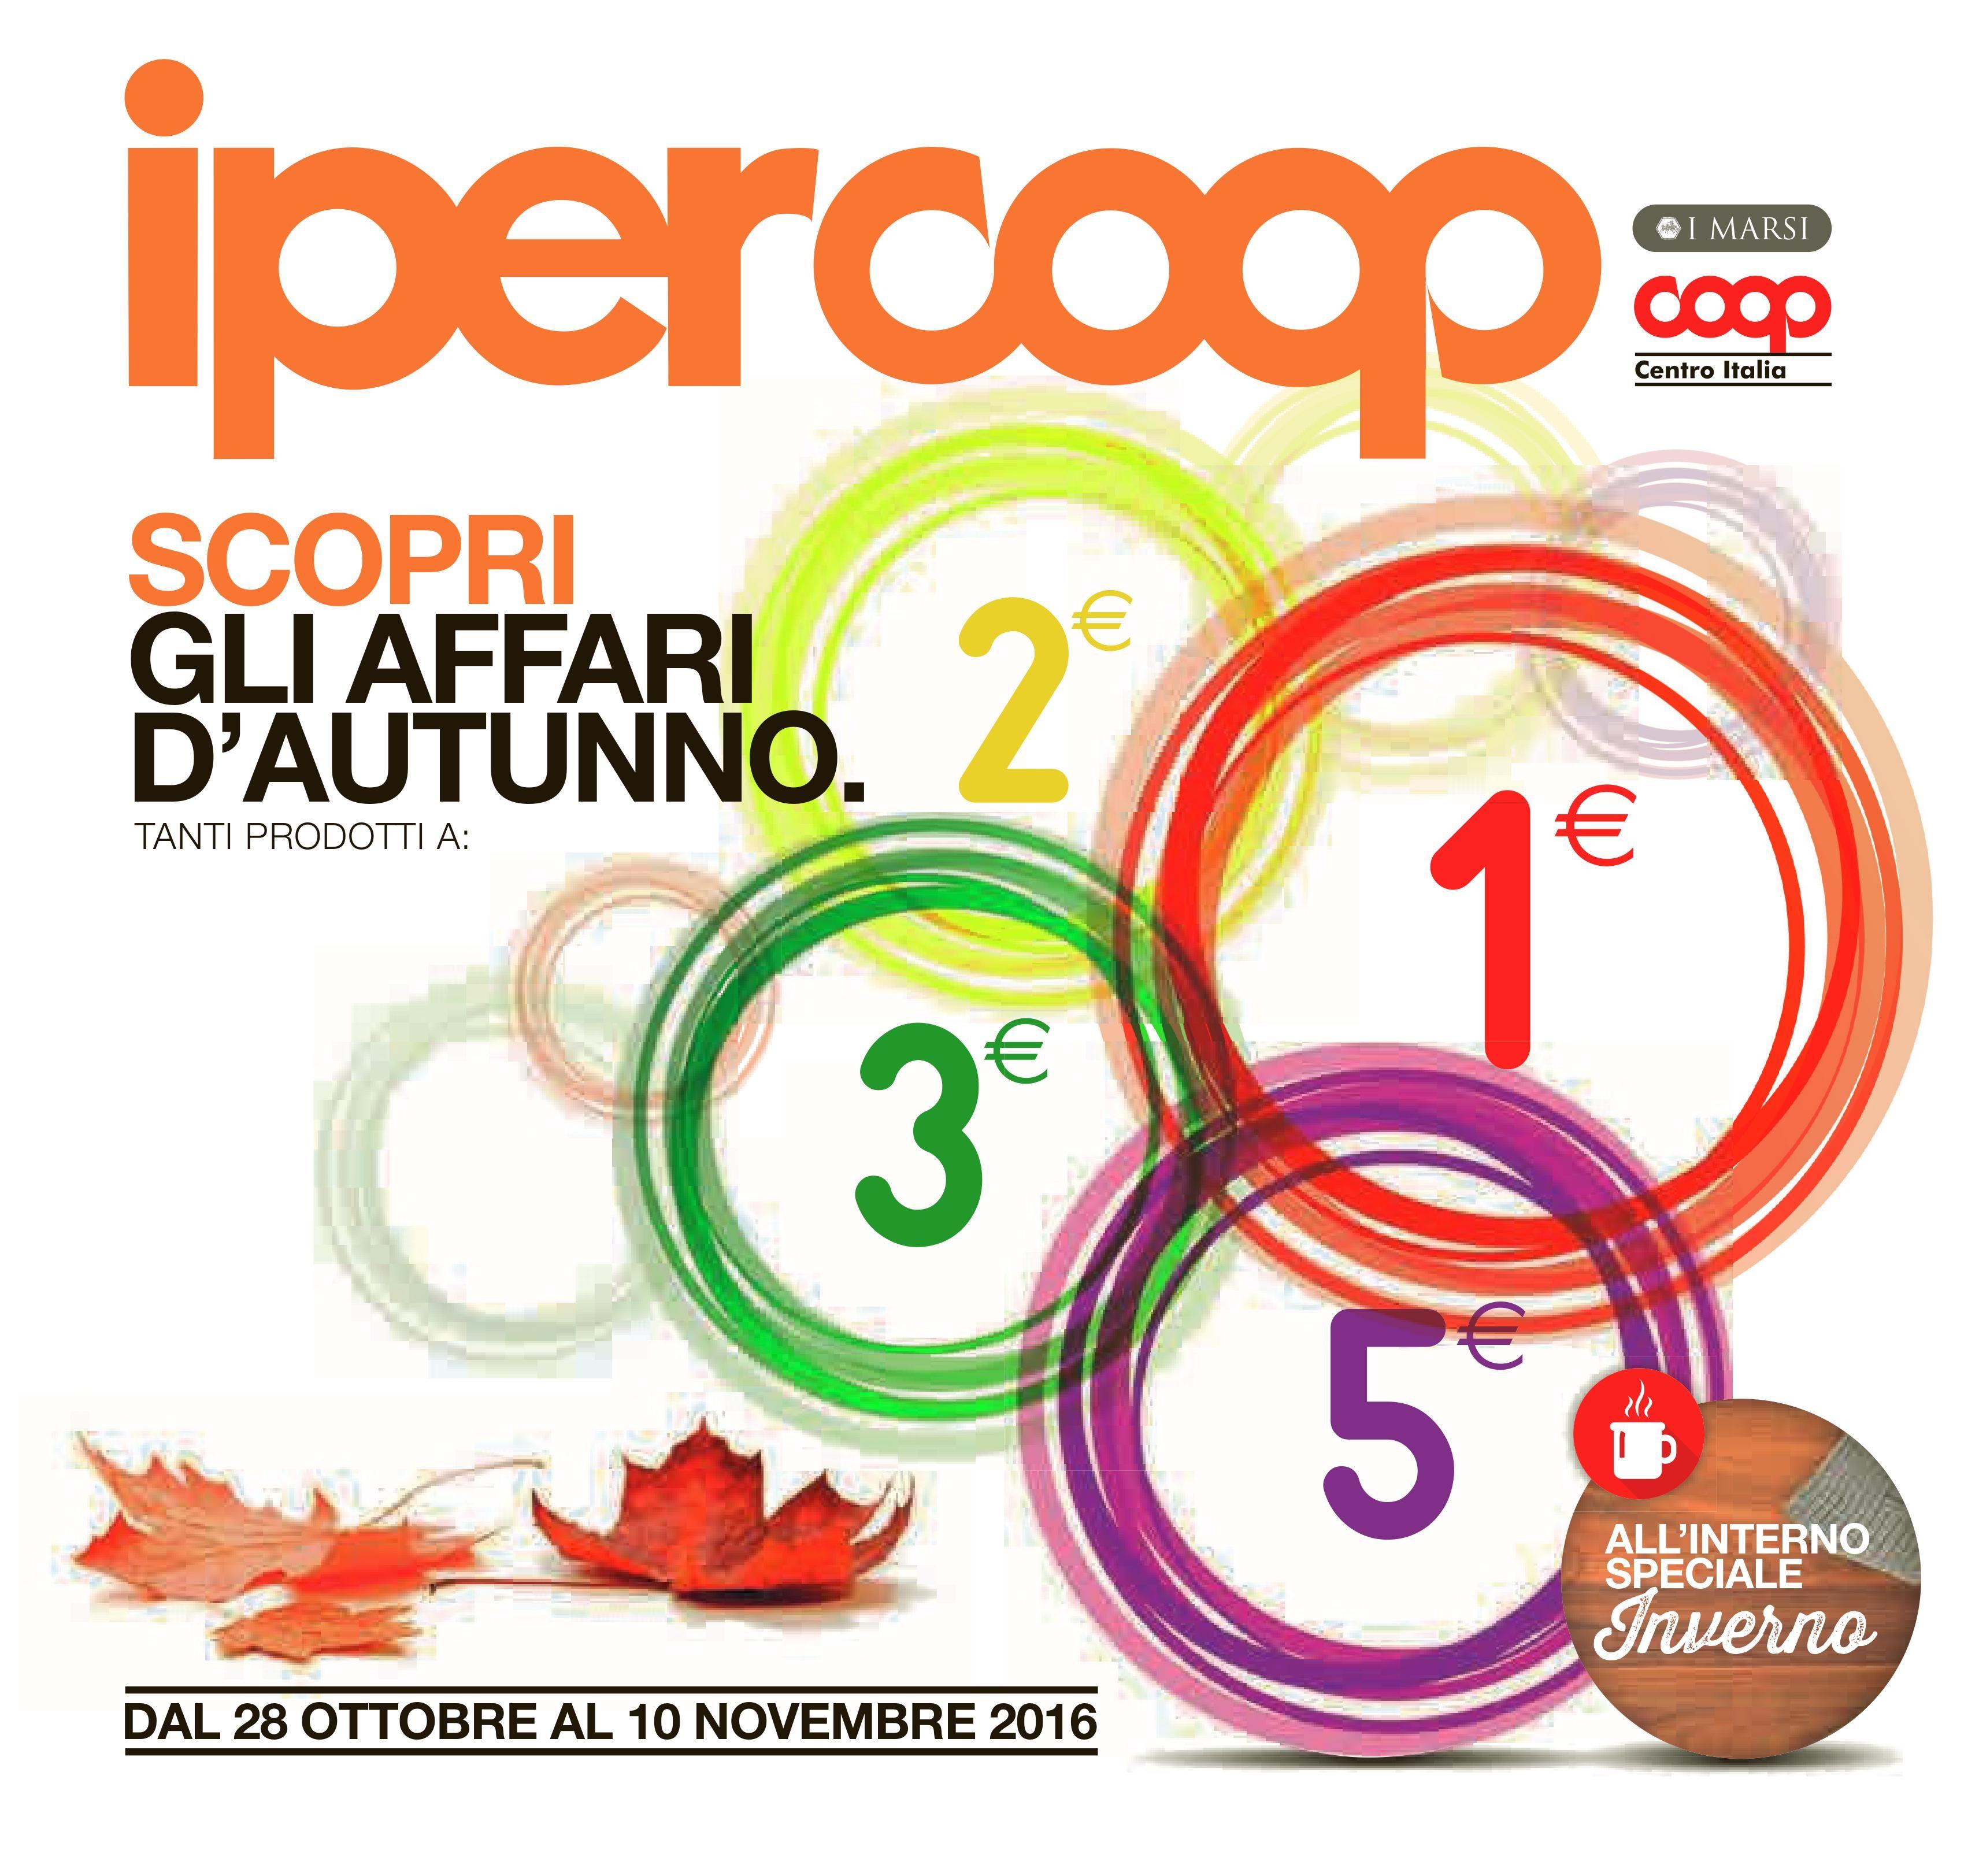 Volantino IperCoop - http://www.volantinoit.com/coop-offerte/